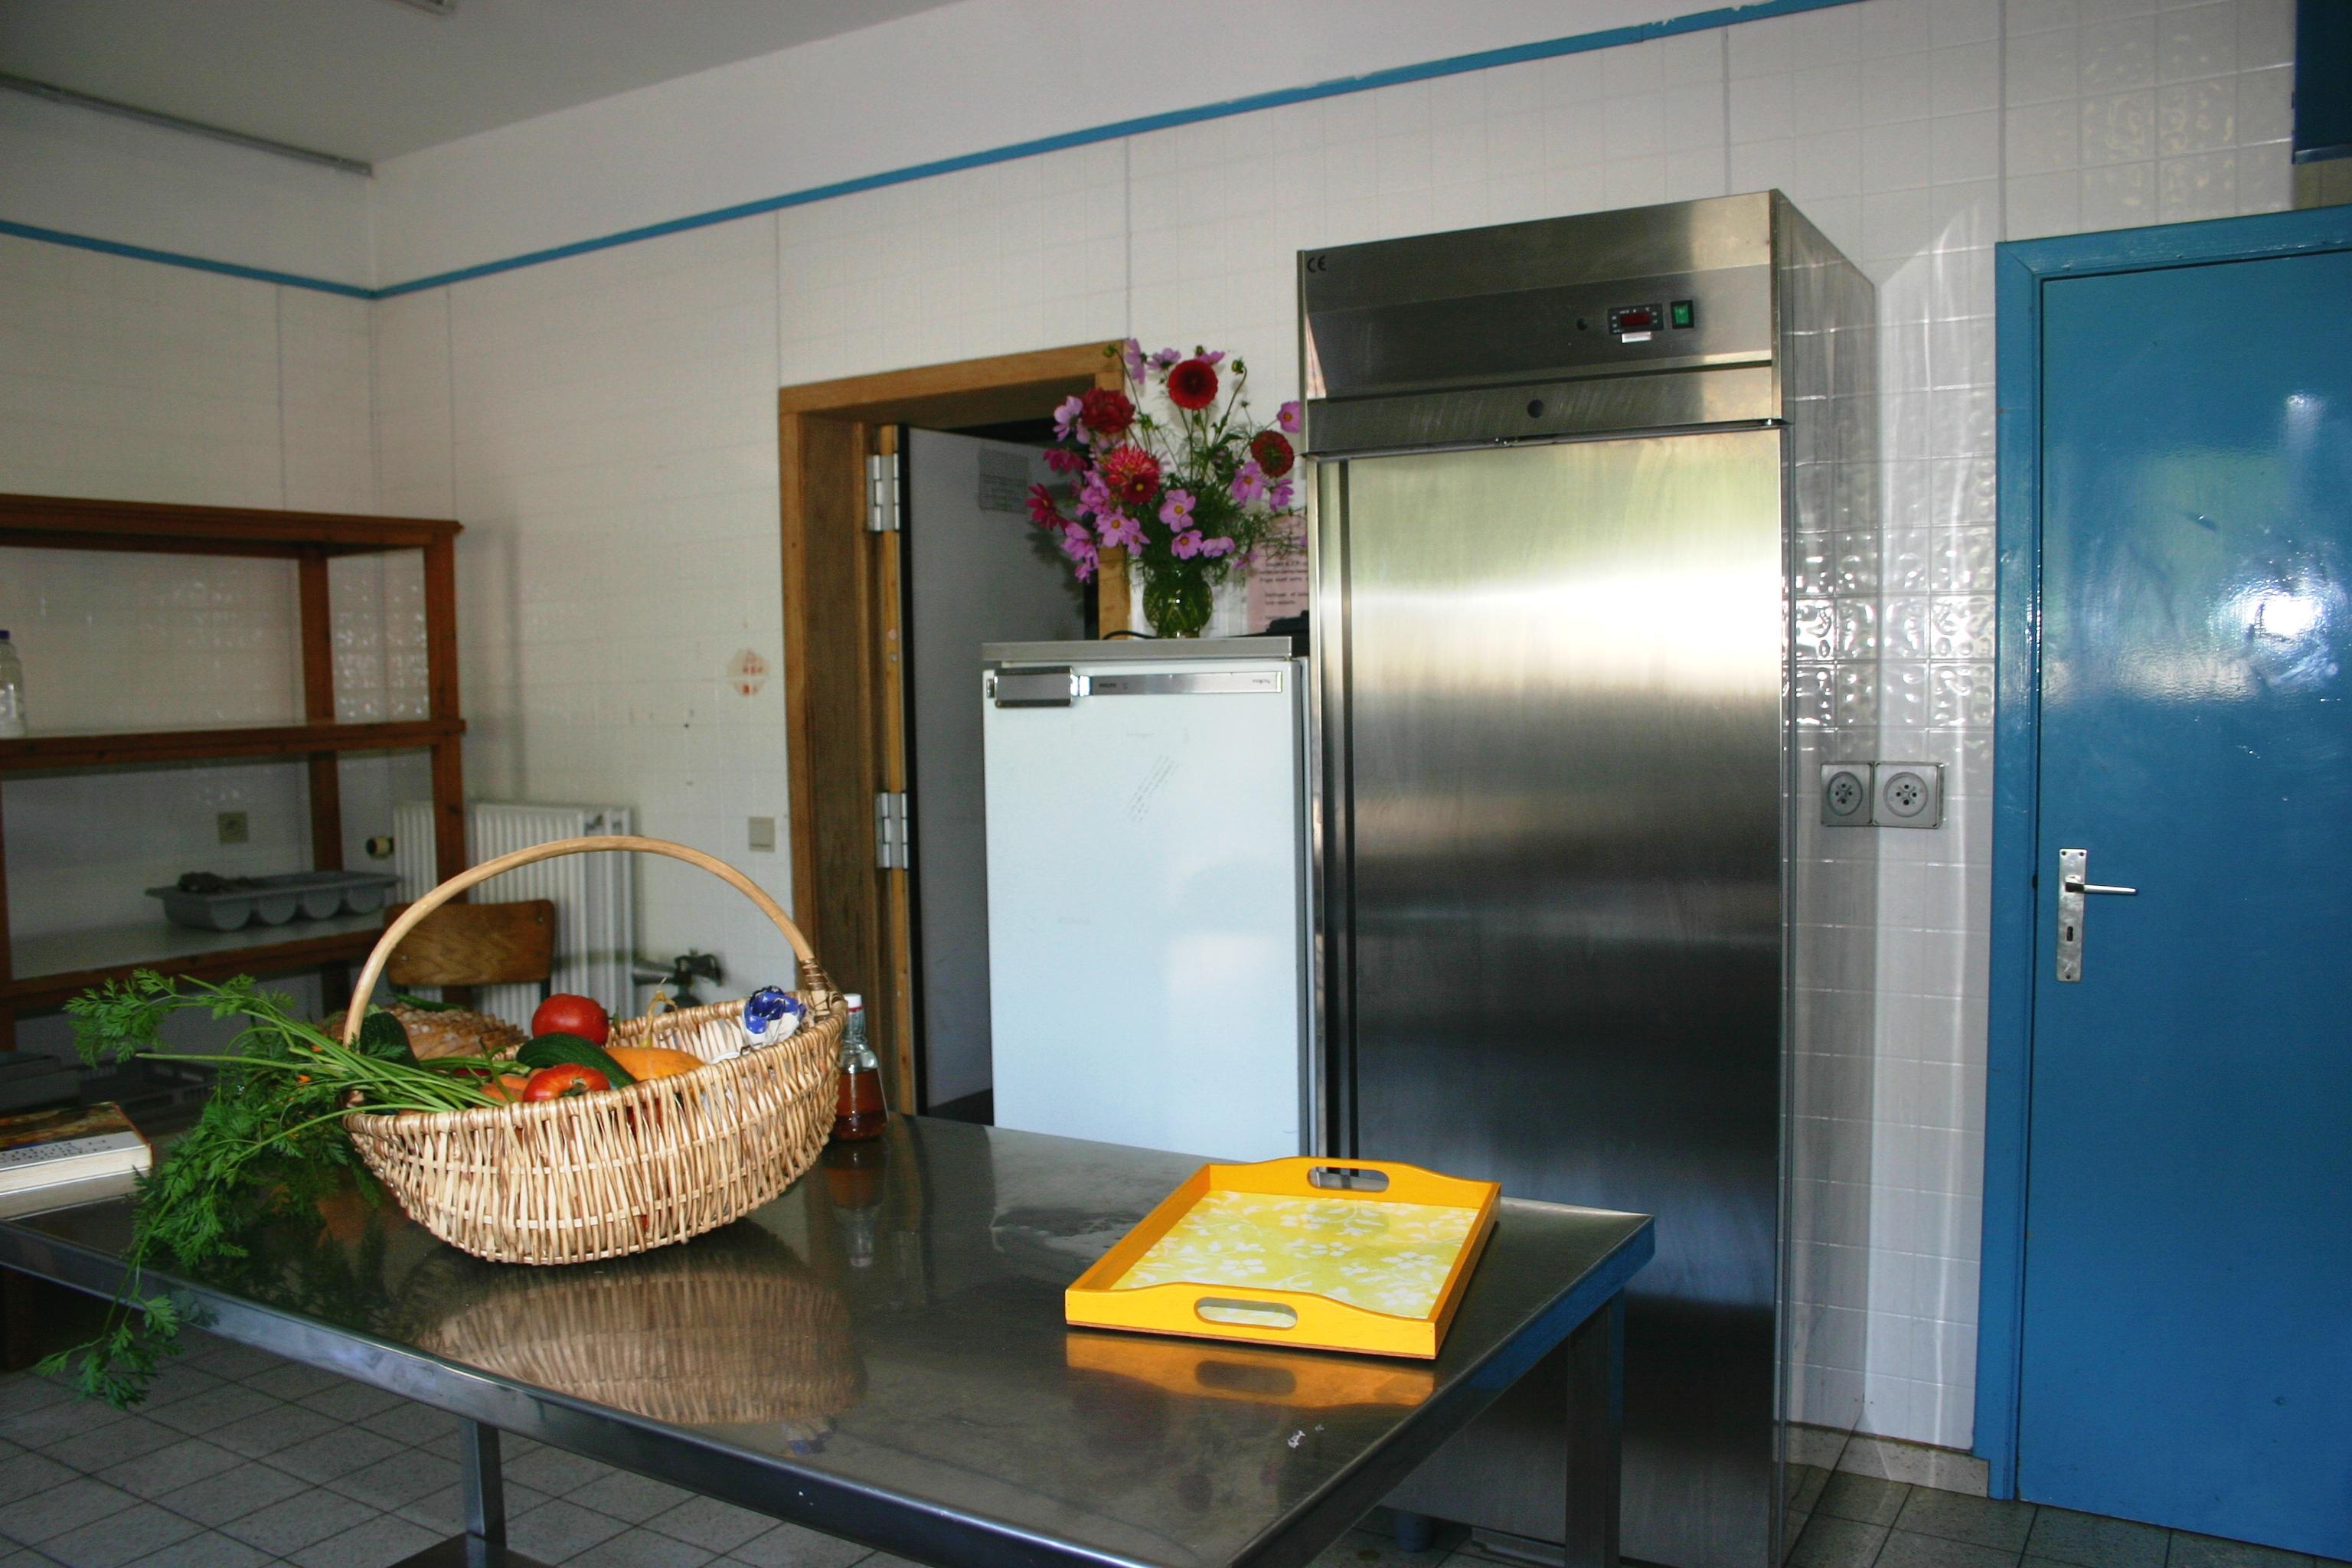 Frigo - chambre froide - lave vaisse